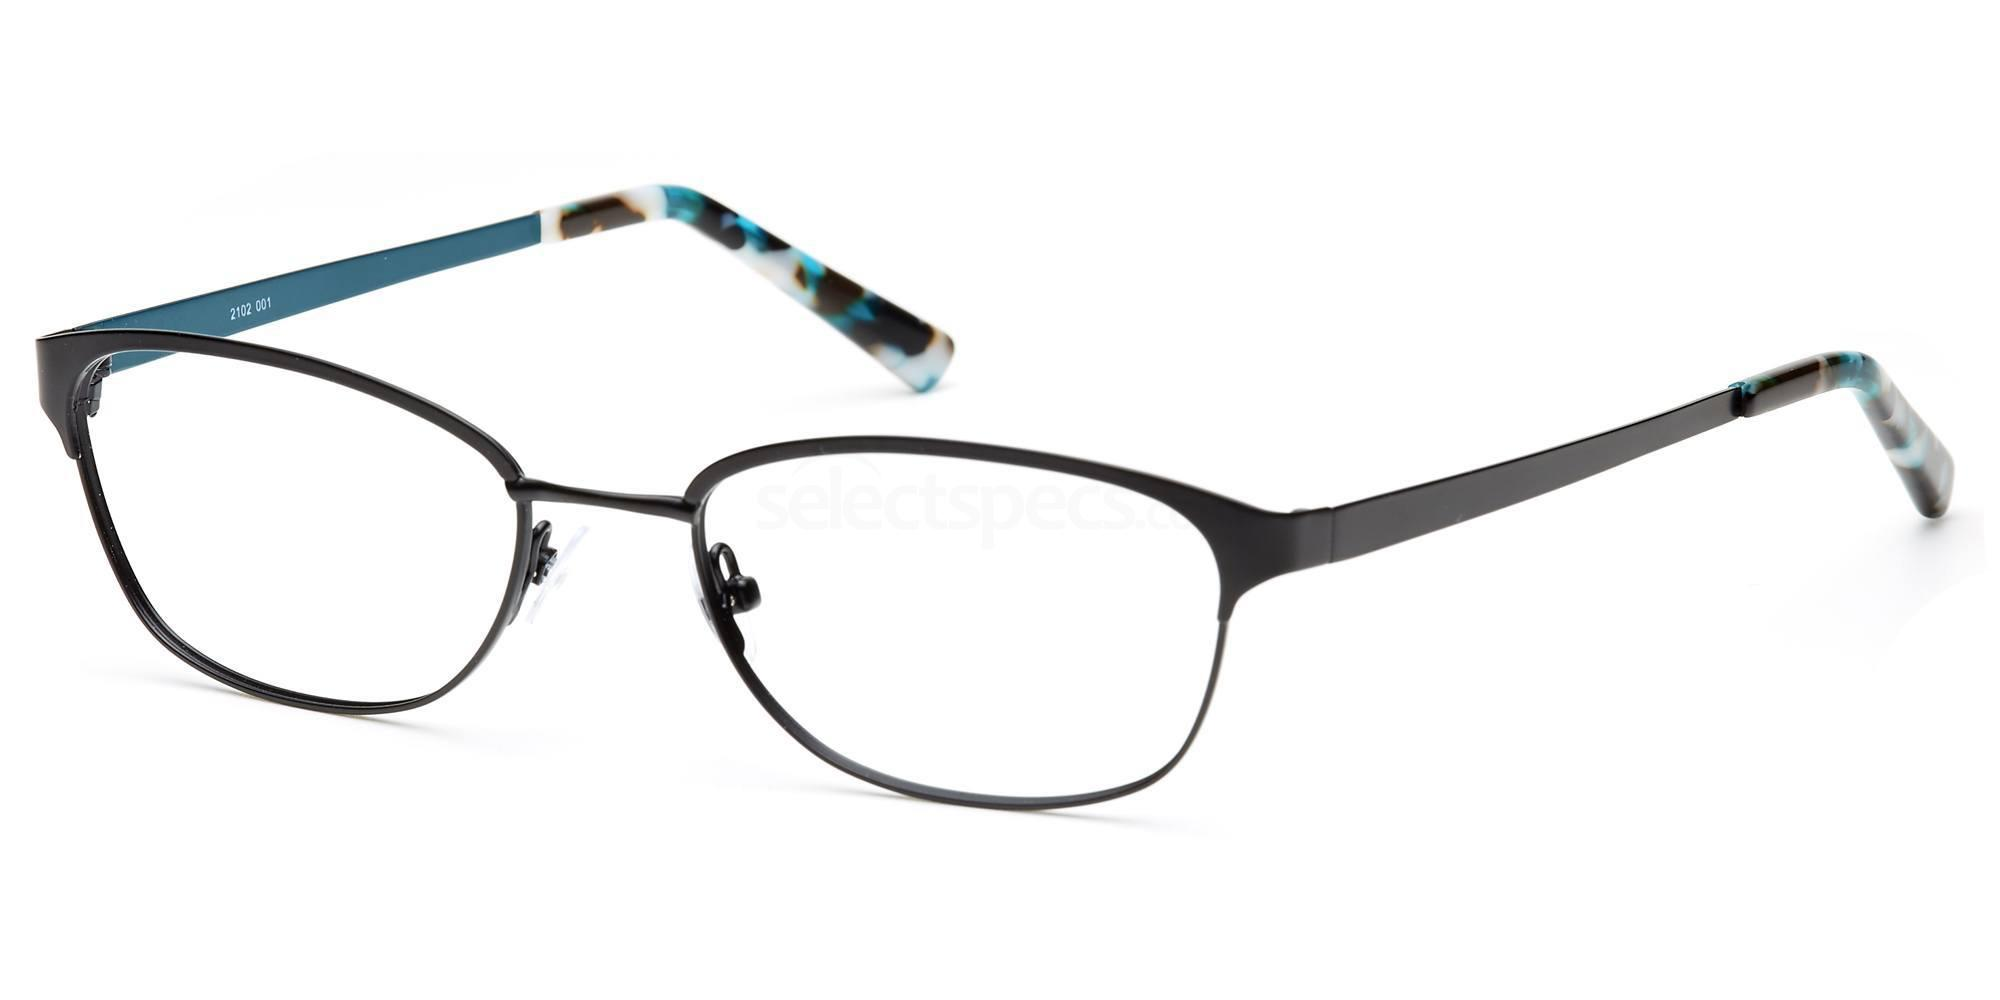 C1 FLX2102 Glasses, Flextra